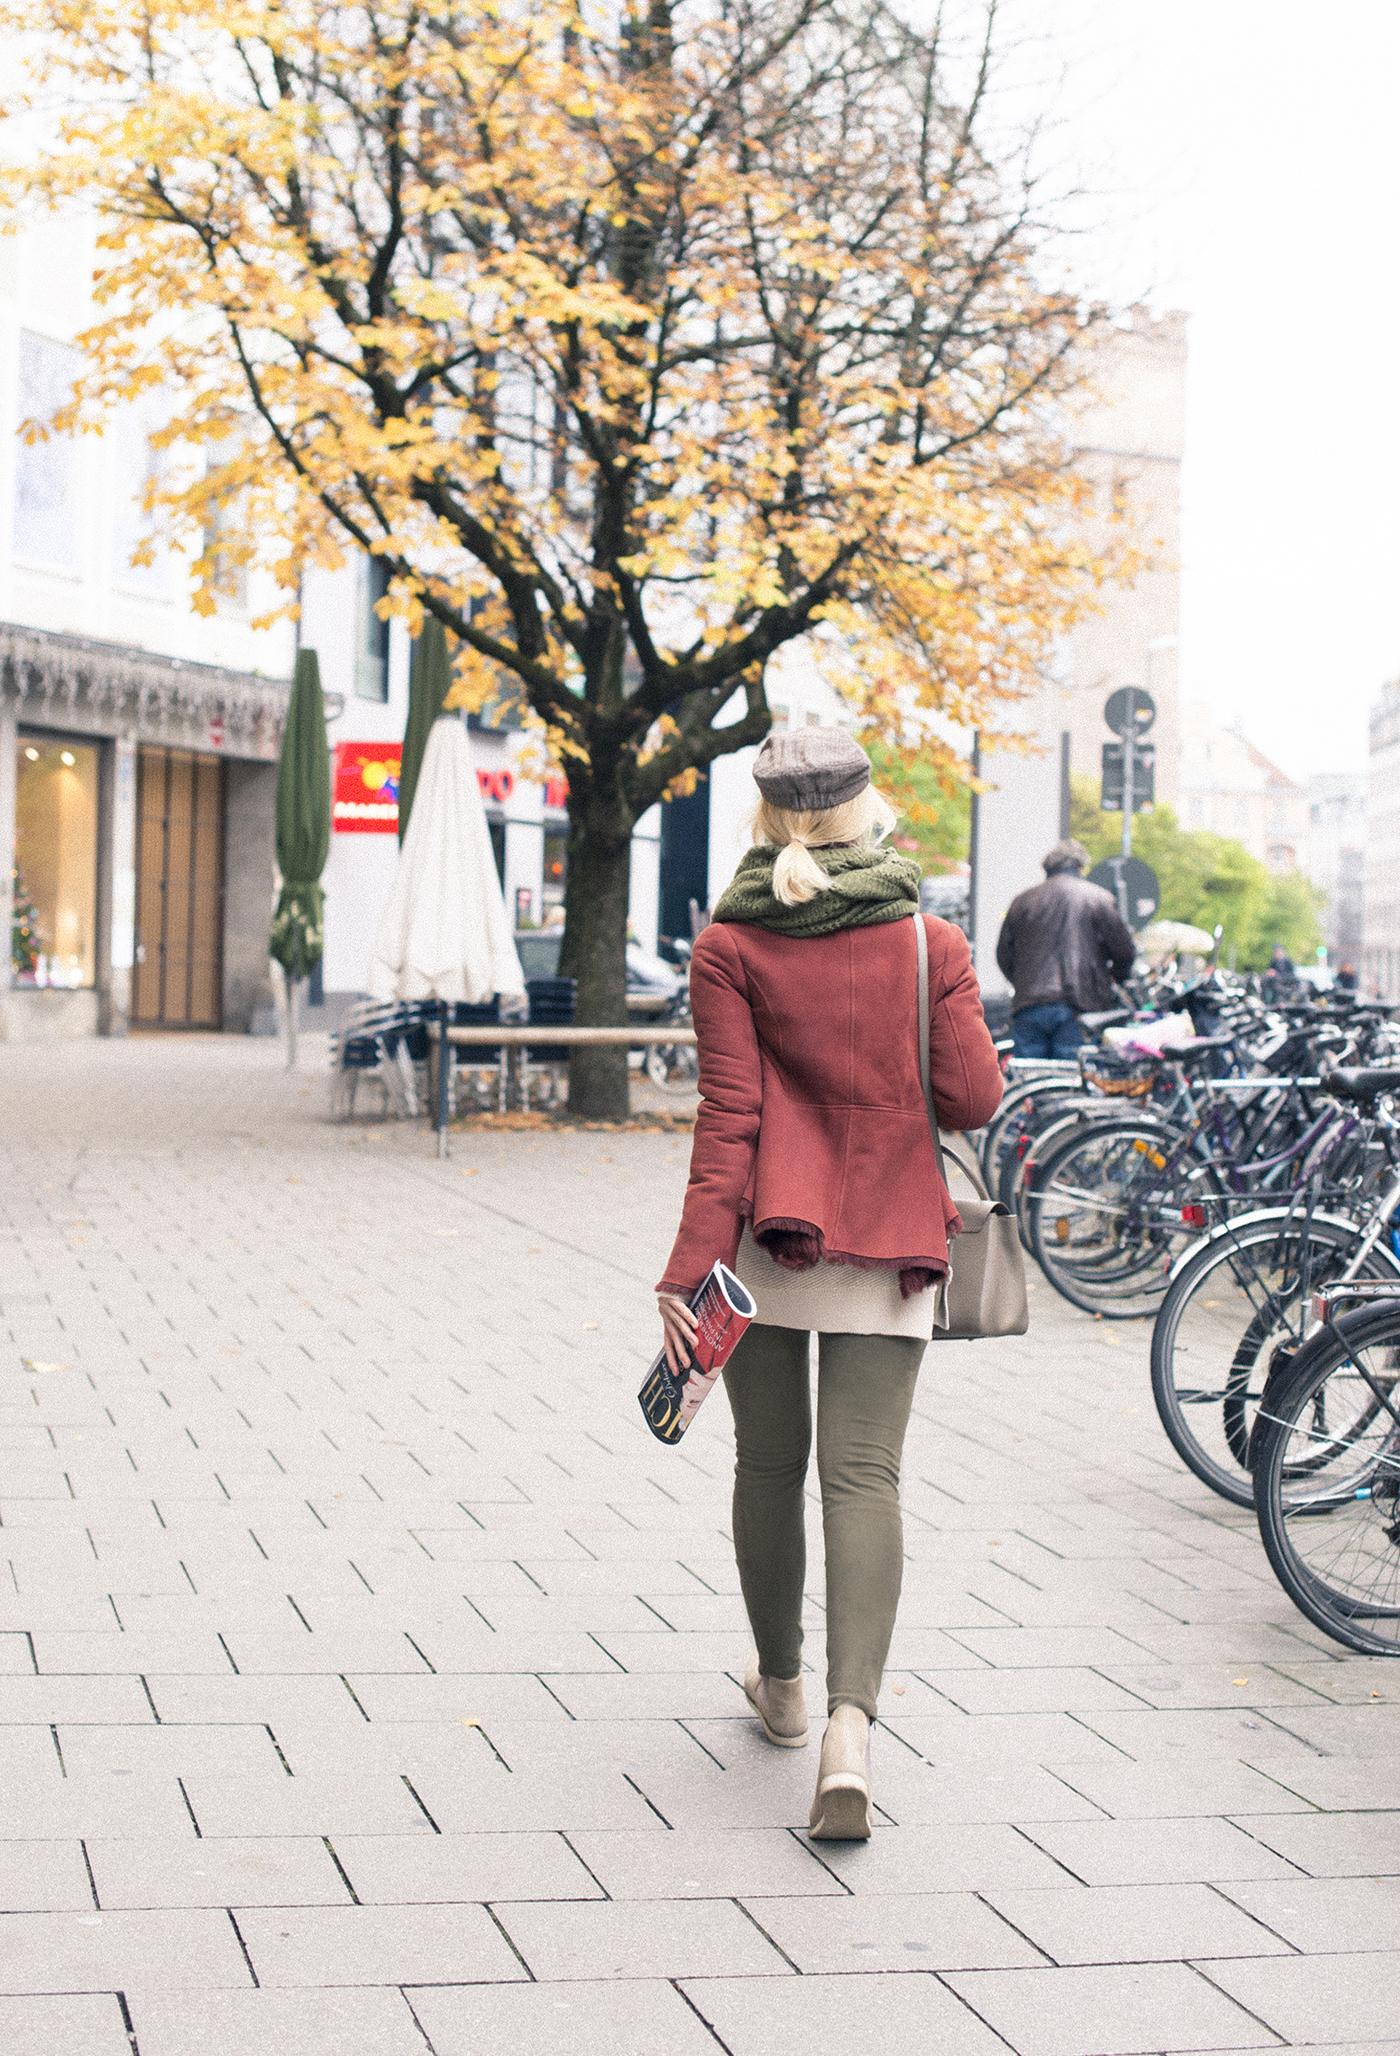 inspiration, streetstyle, winter outfit, annamidday, top fashion blogger, top russian fashion blogger, фэшн блогер, русский блогер, известный блогер, топовый блогер, russian bloger, top russian blogger, streetfashion, russian fashion blogger, blogger, fashion, style, fashionista, модный блогер, российский блогер, ТОП блогер, ootd, lookoftheday, look, популярный блогер, российский модный блогер, russian girl, с чем носить дубленку, с чем носить кепку, осенние цвета, цветовые сочетания, streetstyle, красивая девушка, бордовая дубленка, с чем носить замшевые леггинсы, Анна миддэй, анна мидэй, оправа Vuillet Vega, линзы Crizal, Patrizia Pepe FW 2016, SHORT COAT IN VELOURS CALFSKIN, 2L0722 A282, Patrzia Pepe, fur coat streetstyle, Patrizia Pepe bag, девушка в очках